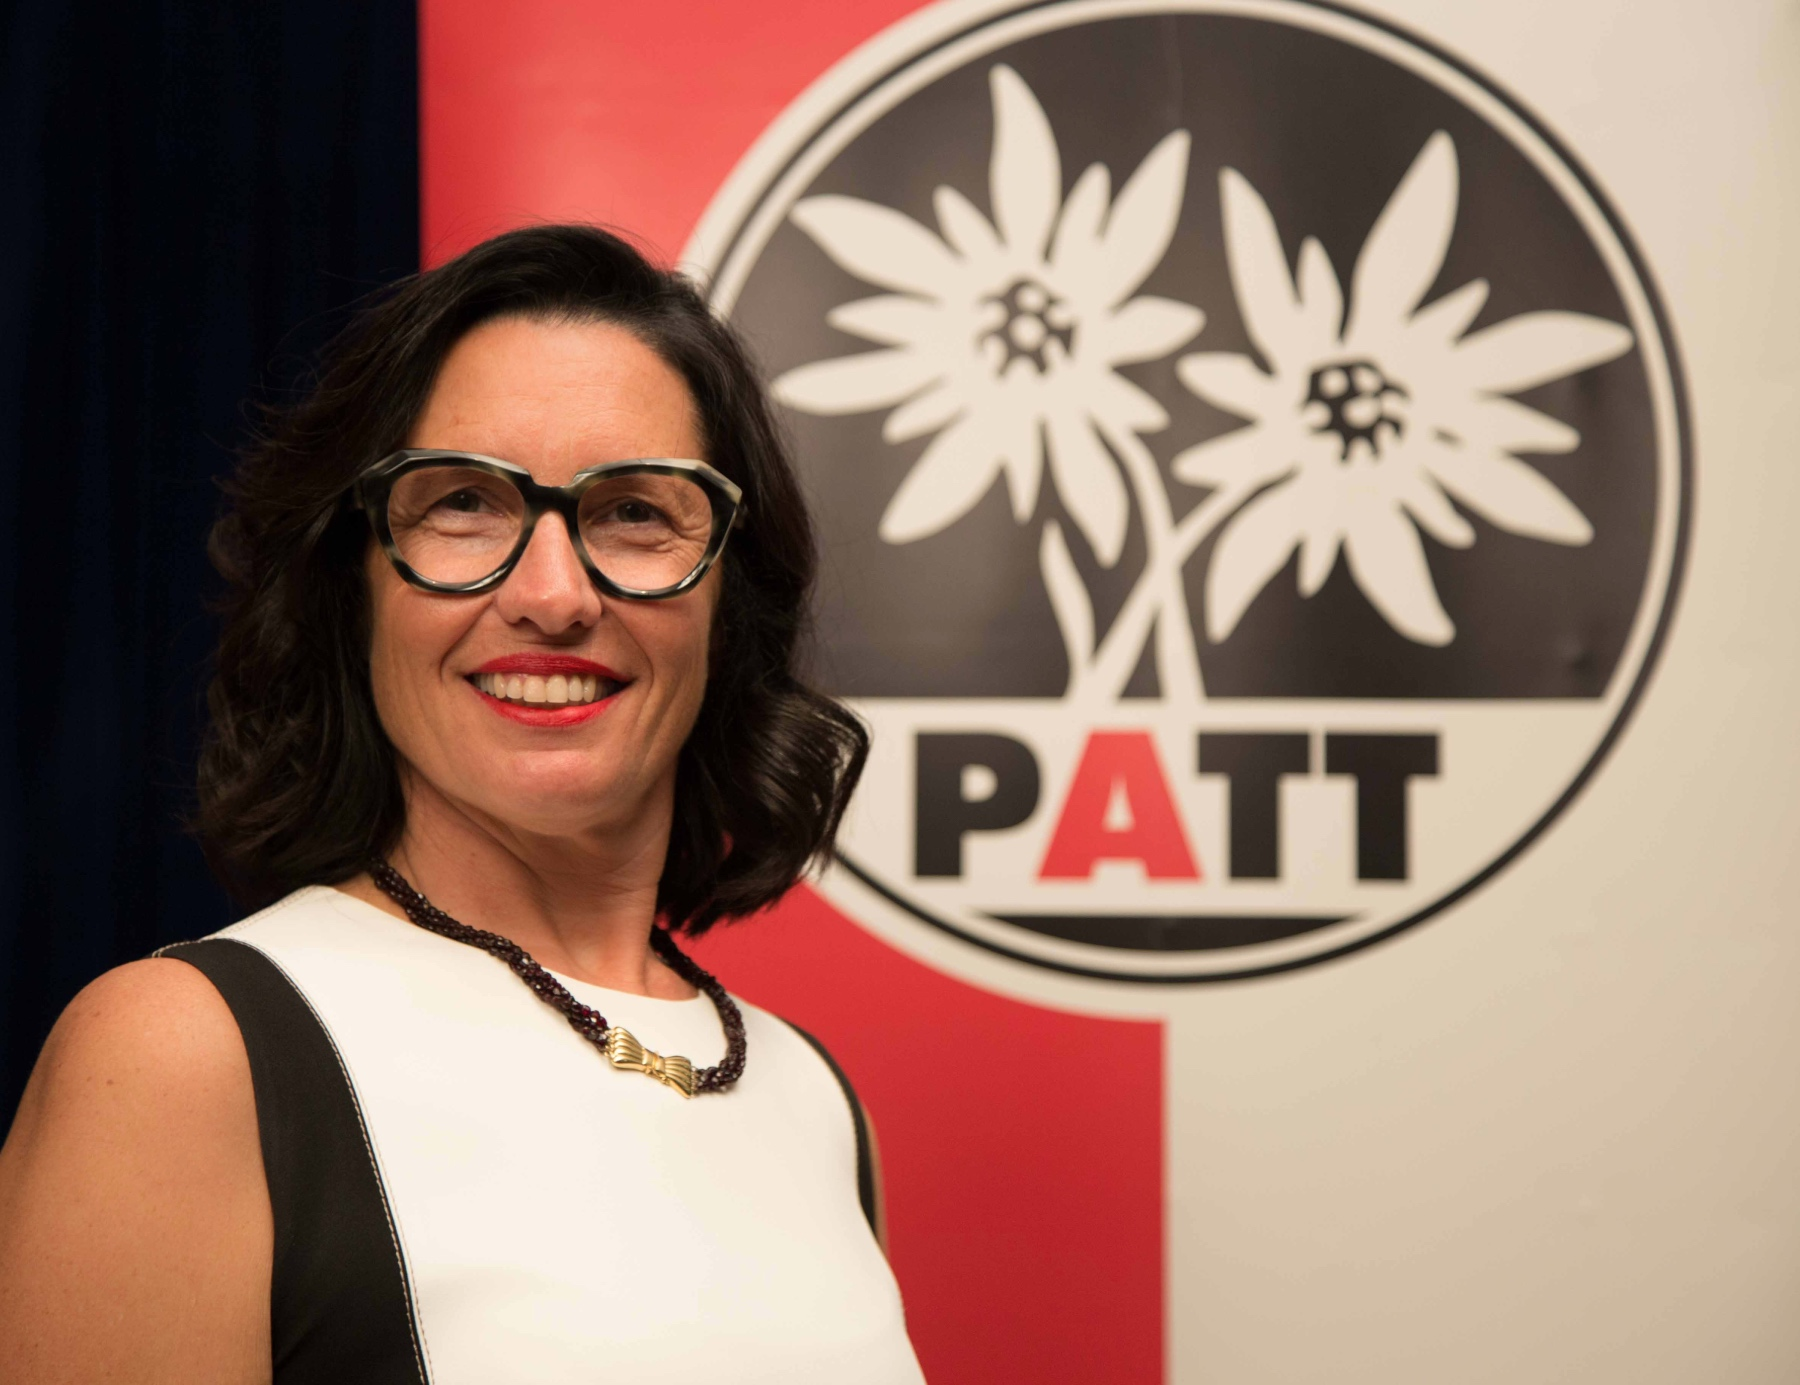 Paola Demagri